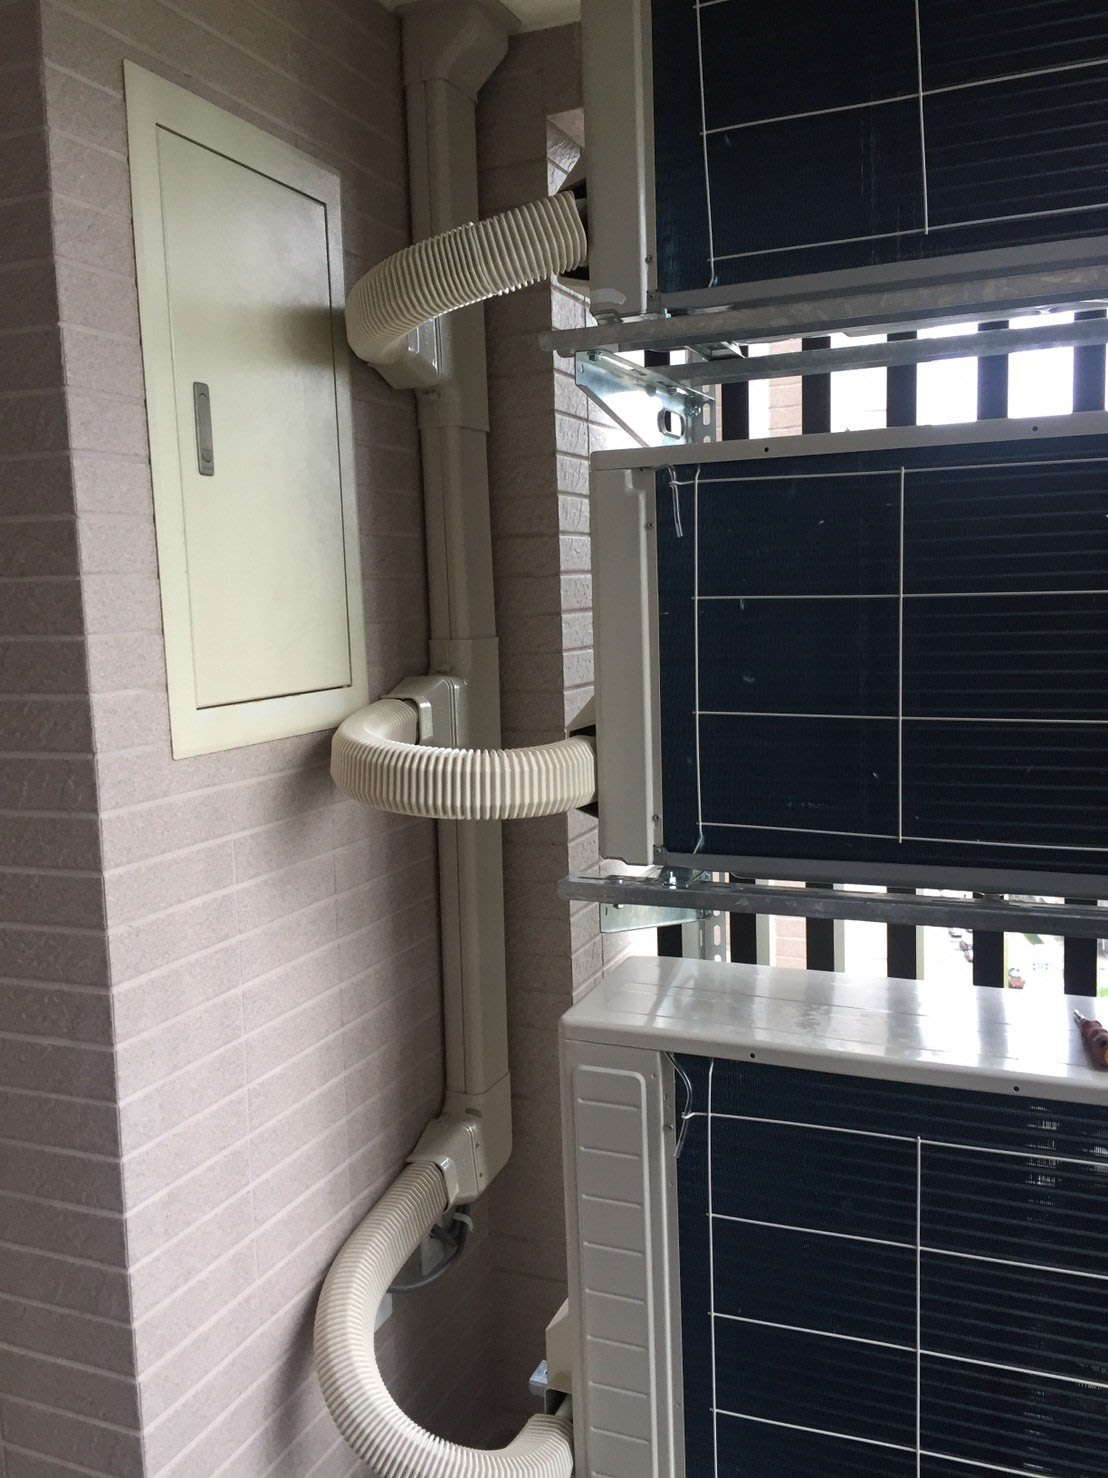 《CHO空調》《2MXM75RVLT》大金冷氣一對二室外機另DXM80ZMT 4C80NA ASCG072LBTA3